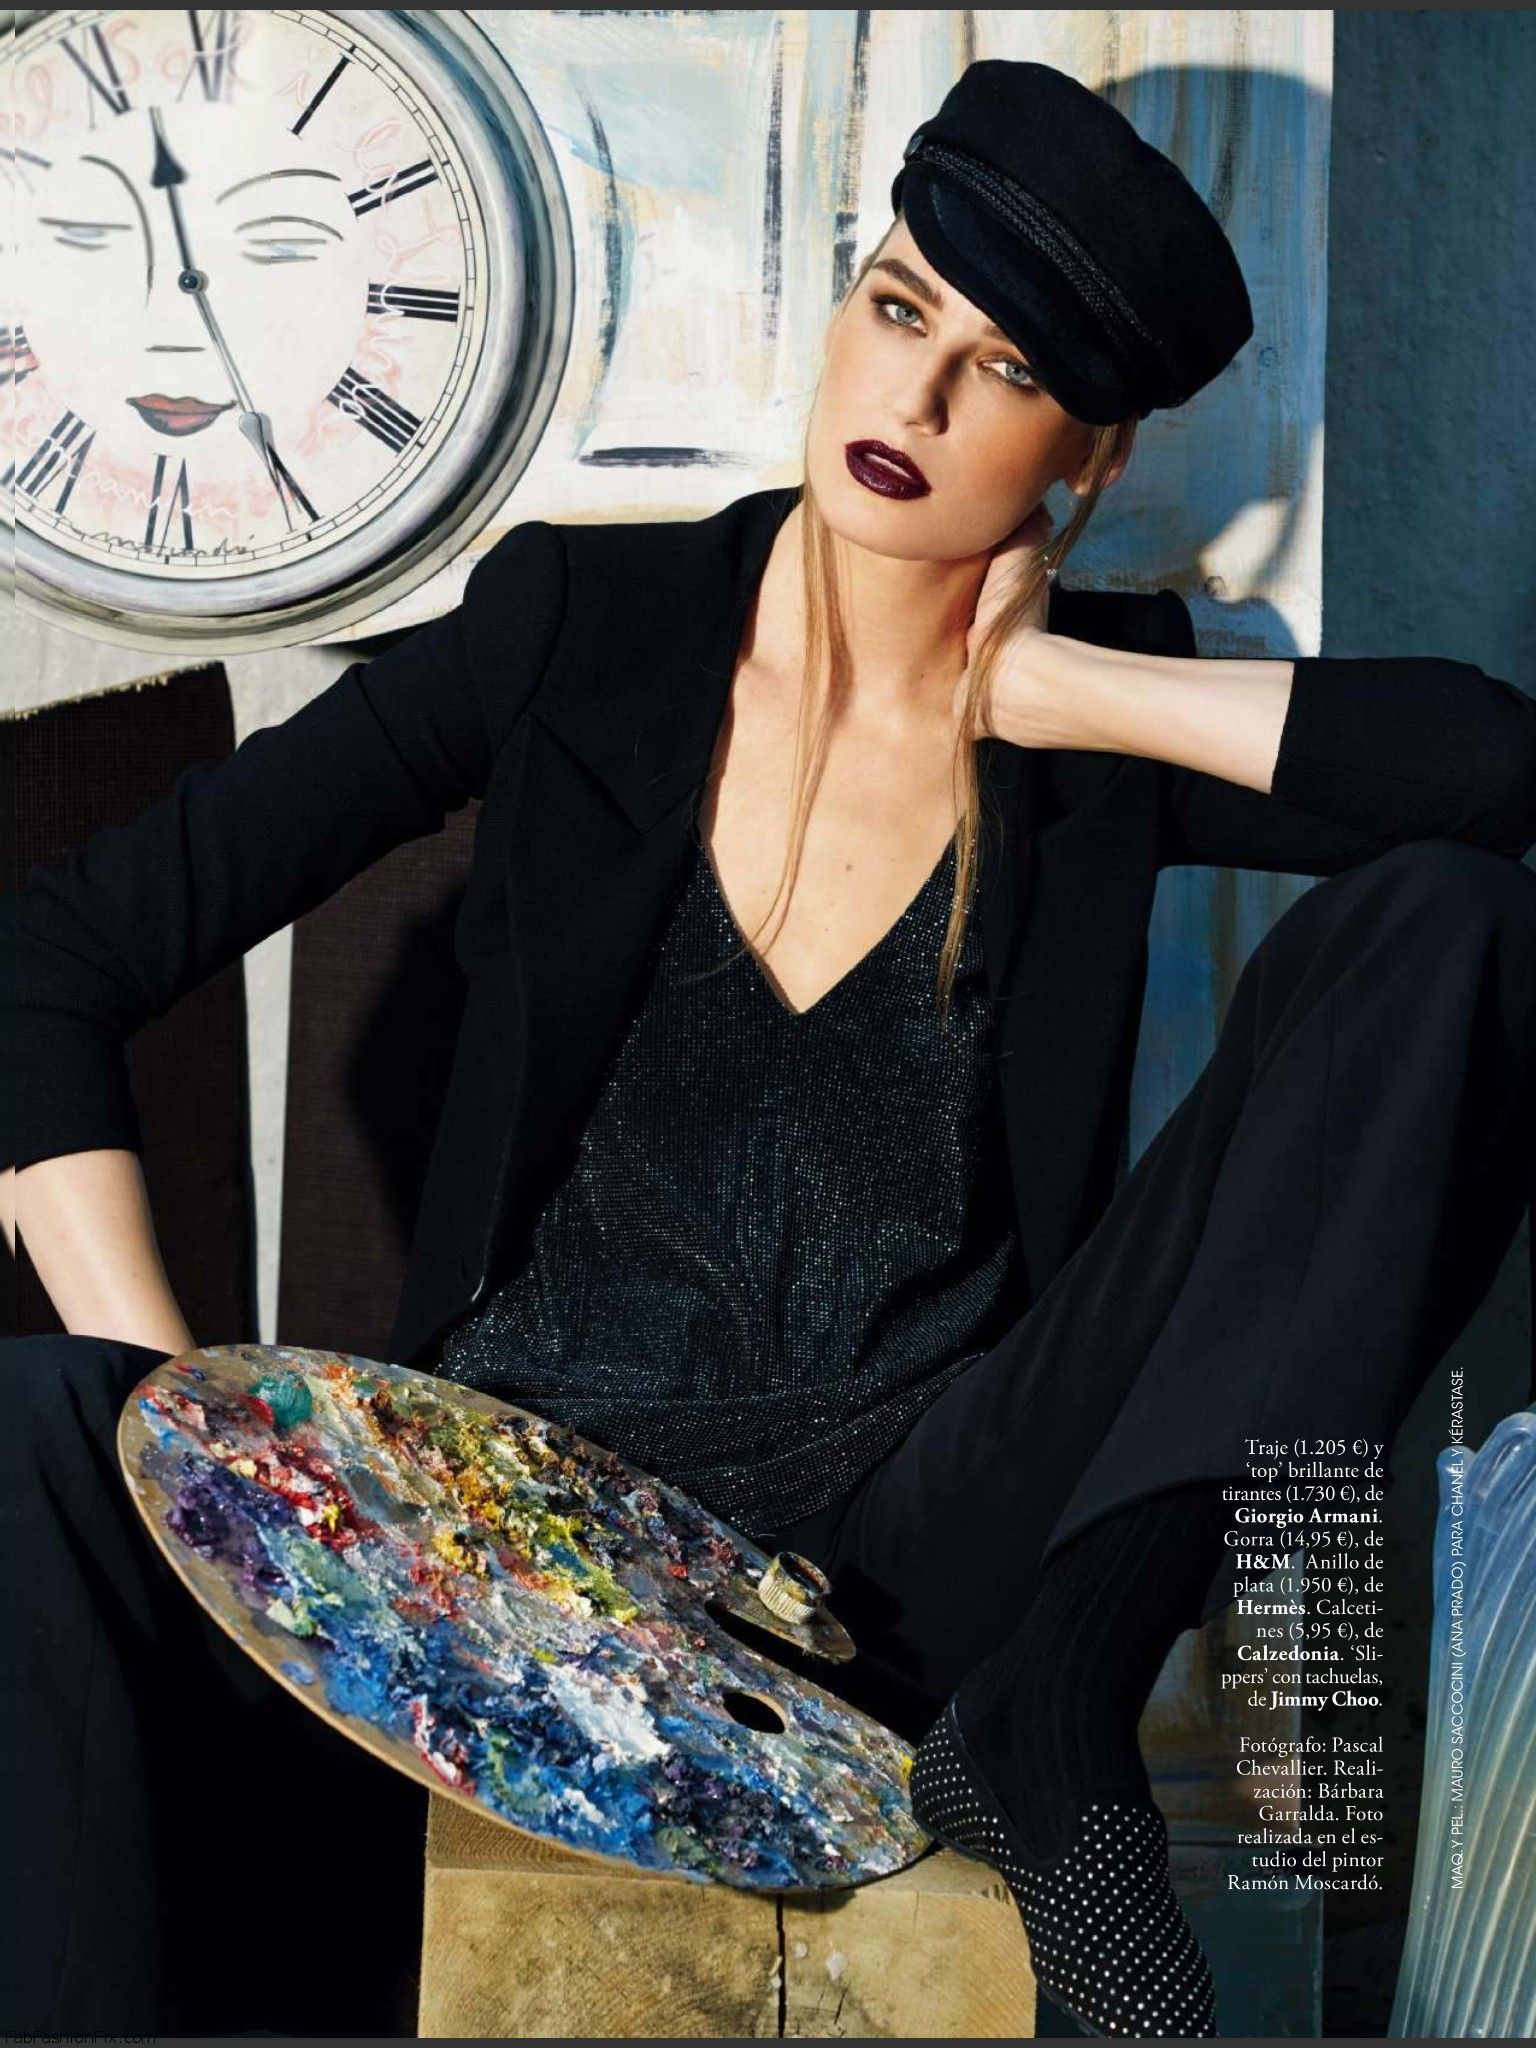 fashion_scans_remastered-eugenia_volodina-elle_espana-september_2013-scanned_by_vampirehorde-hq-32